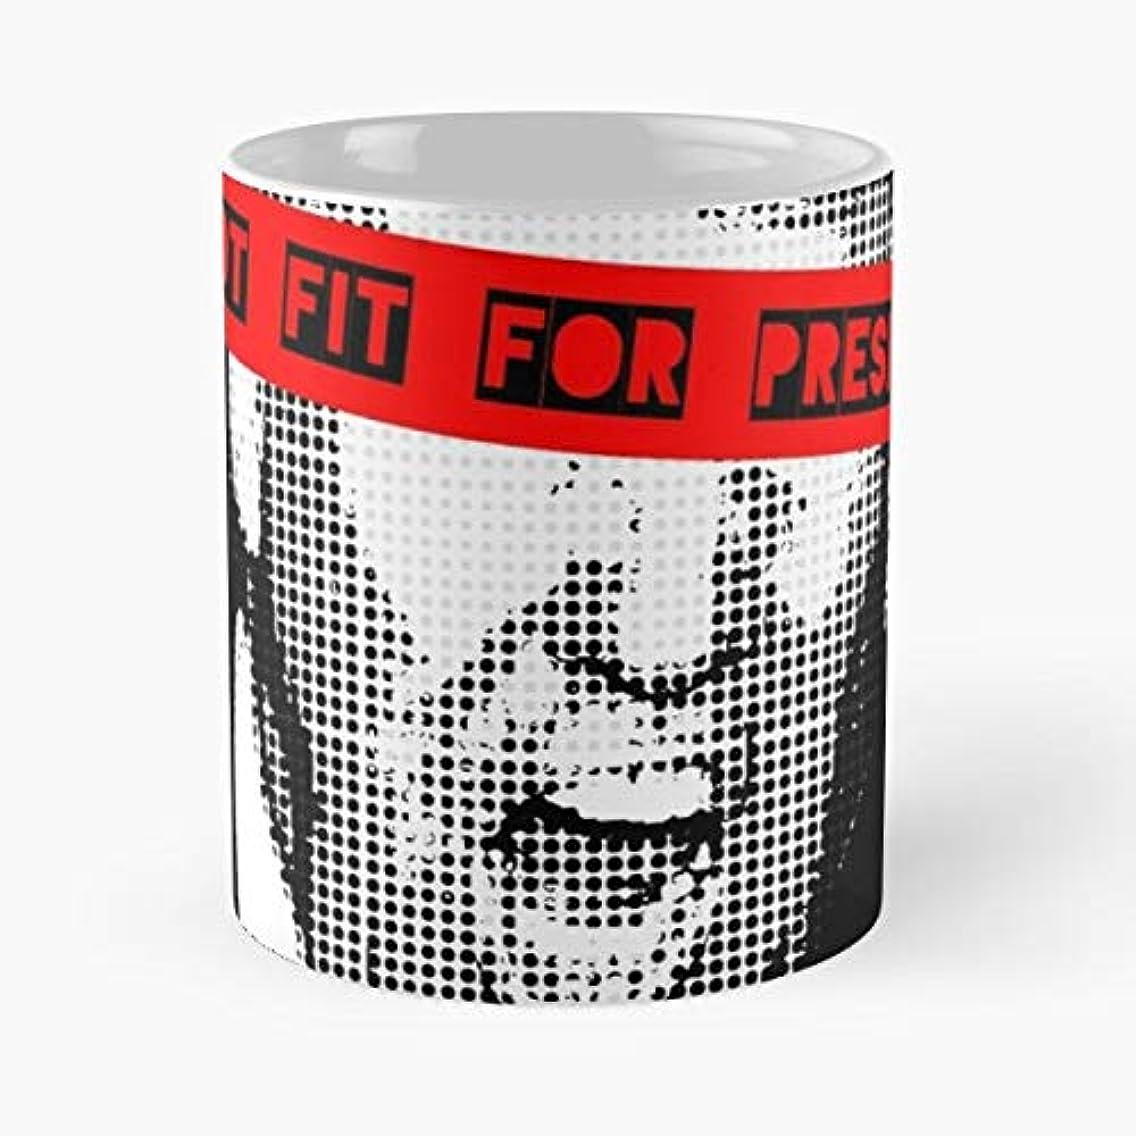 Donald Trump 2016 Election Tower Trumpism Coffee Mugs 11 Oz